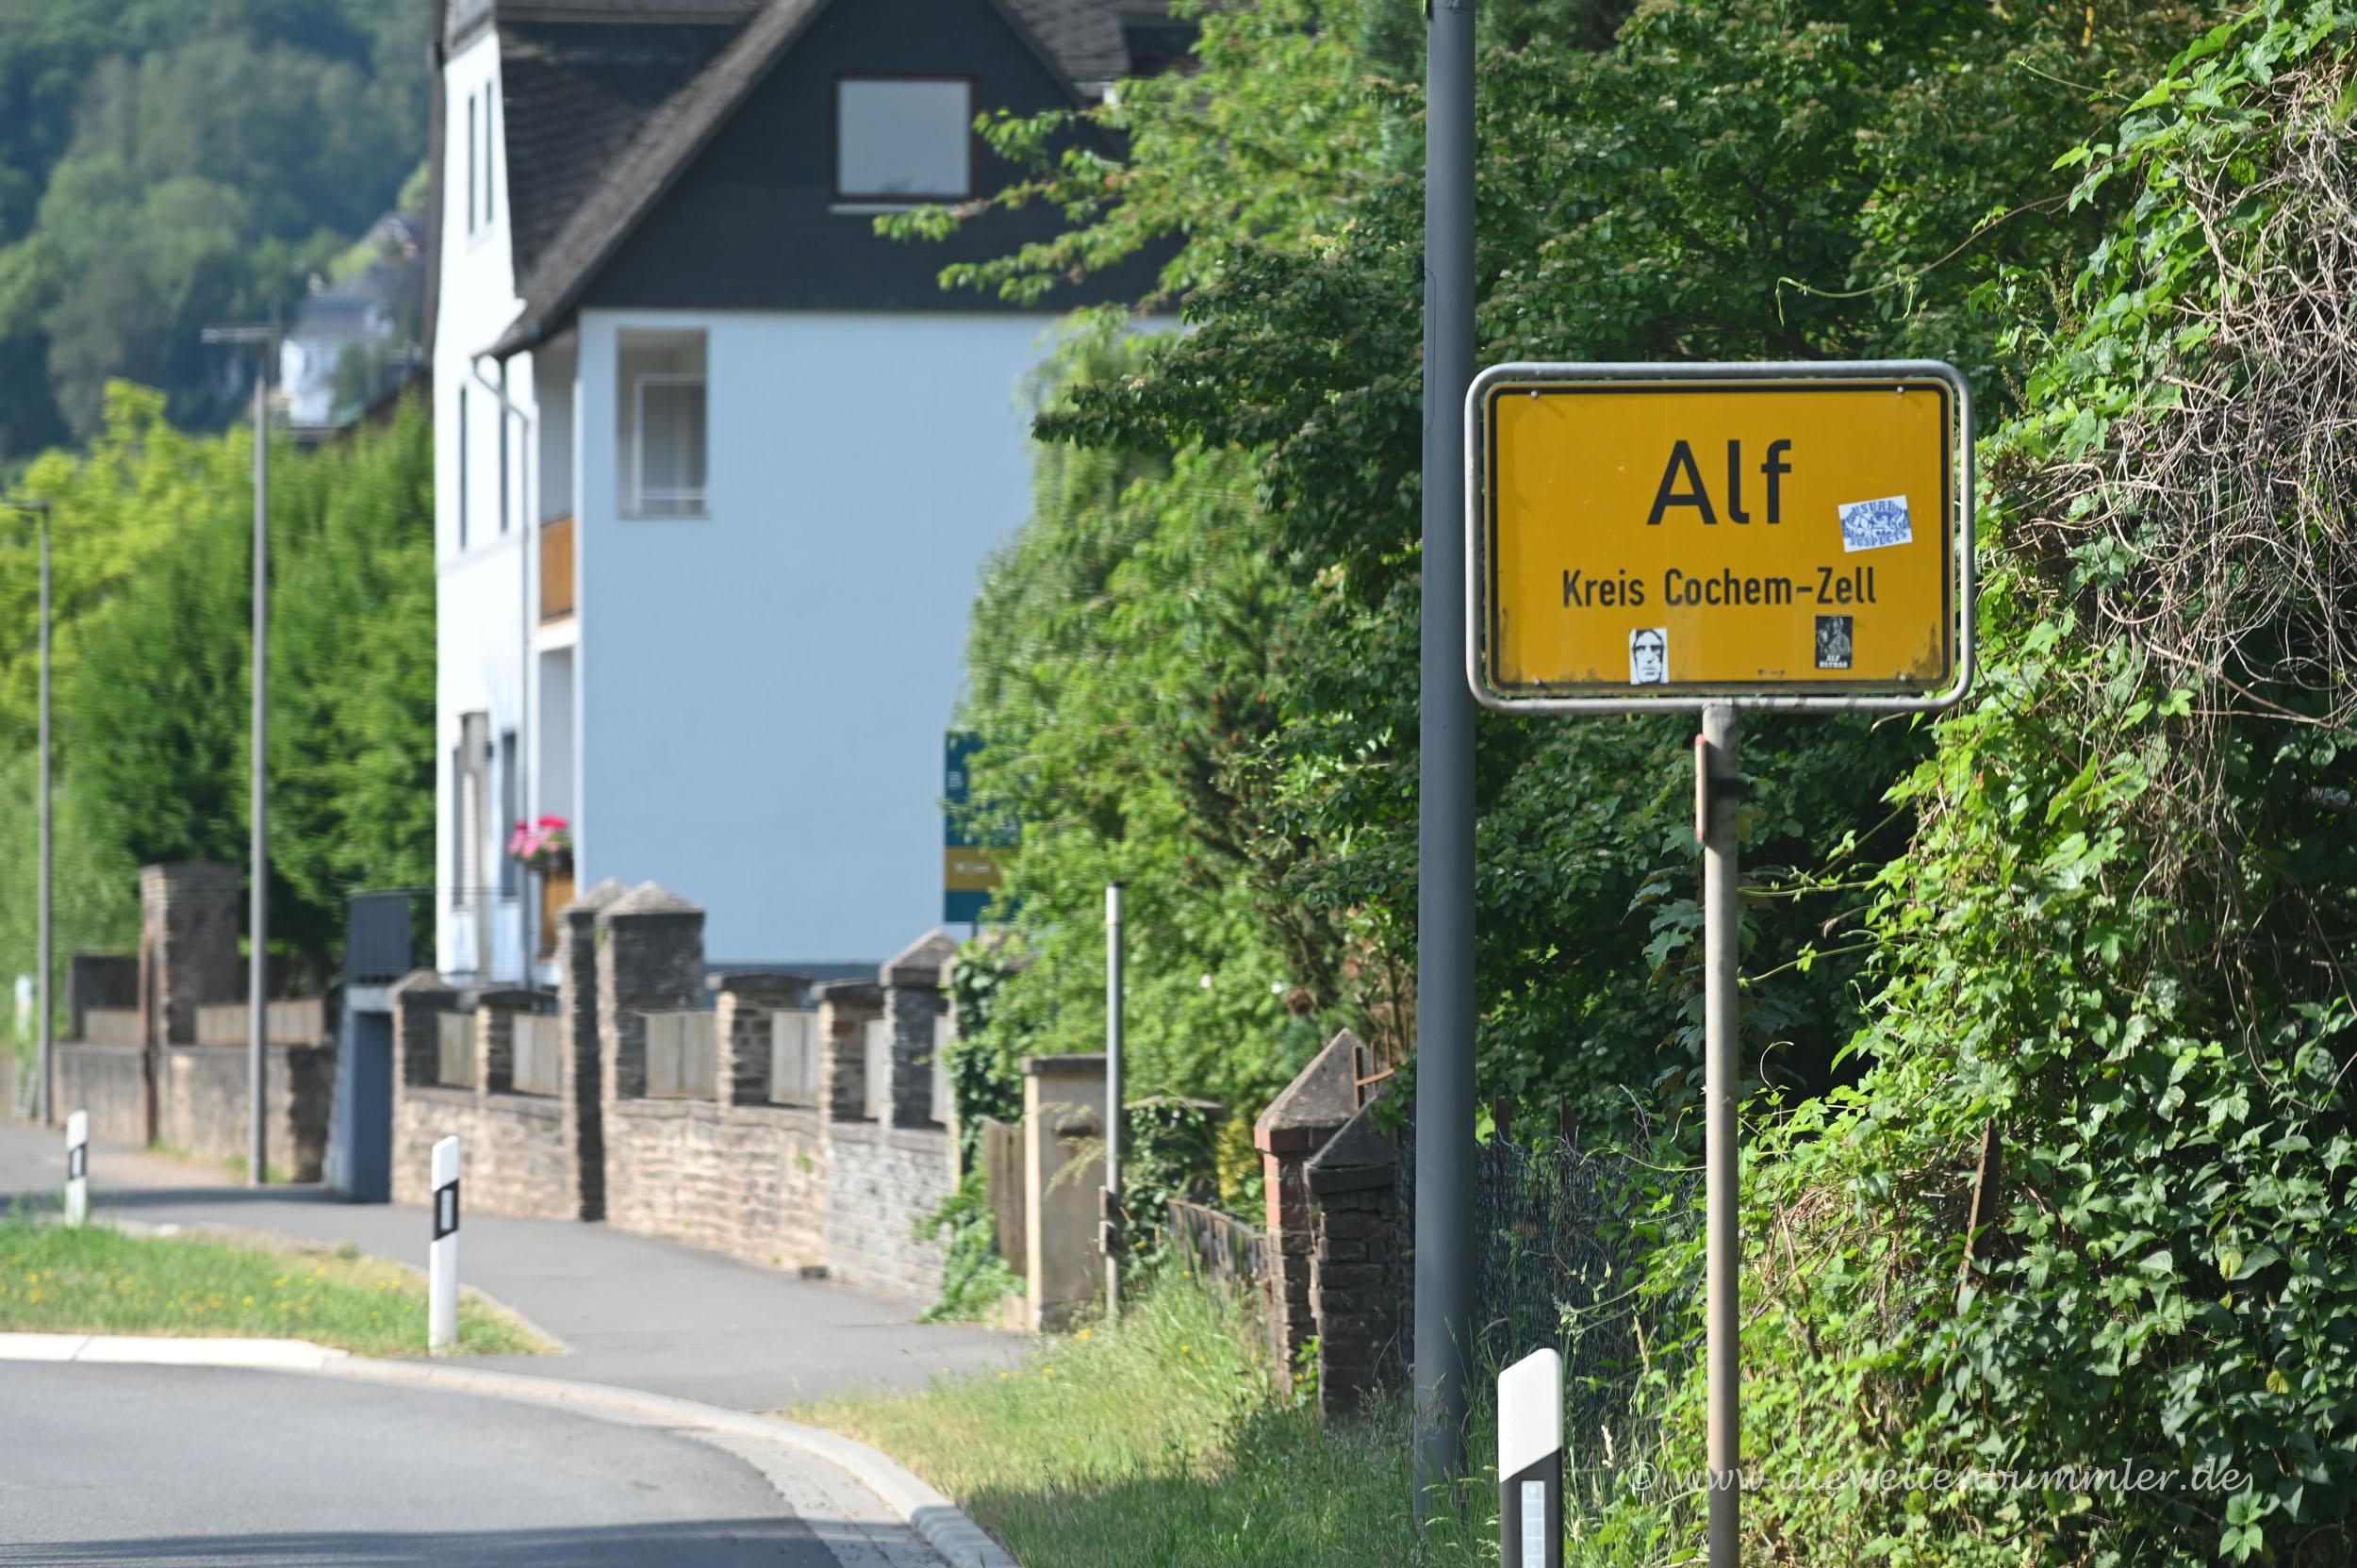 Alf - der Ort